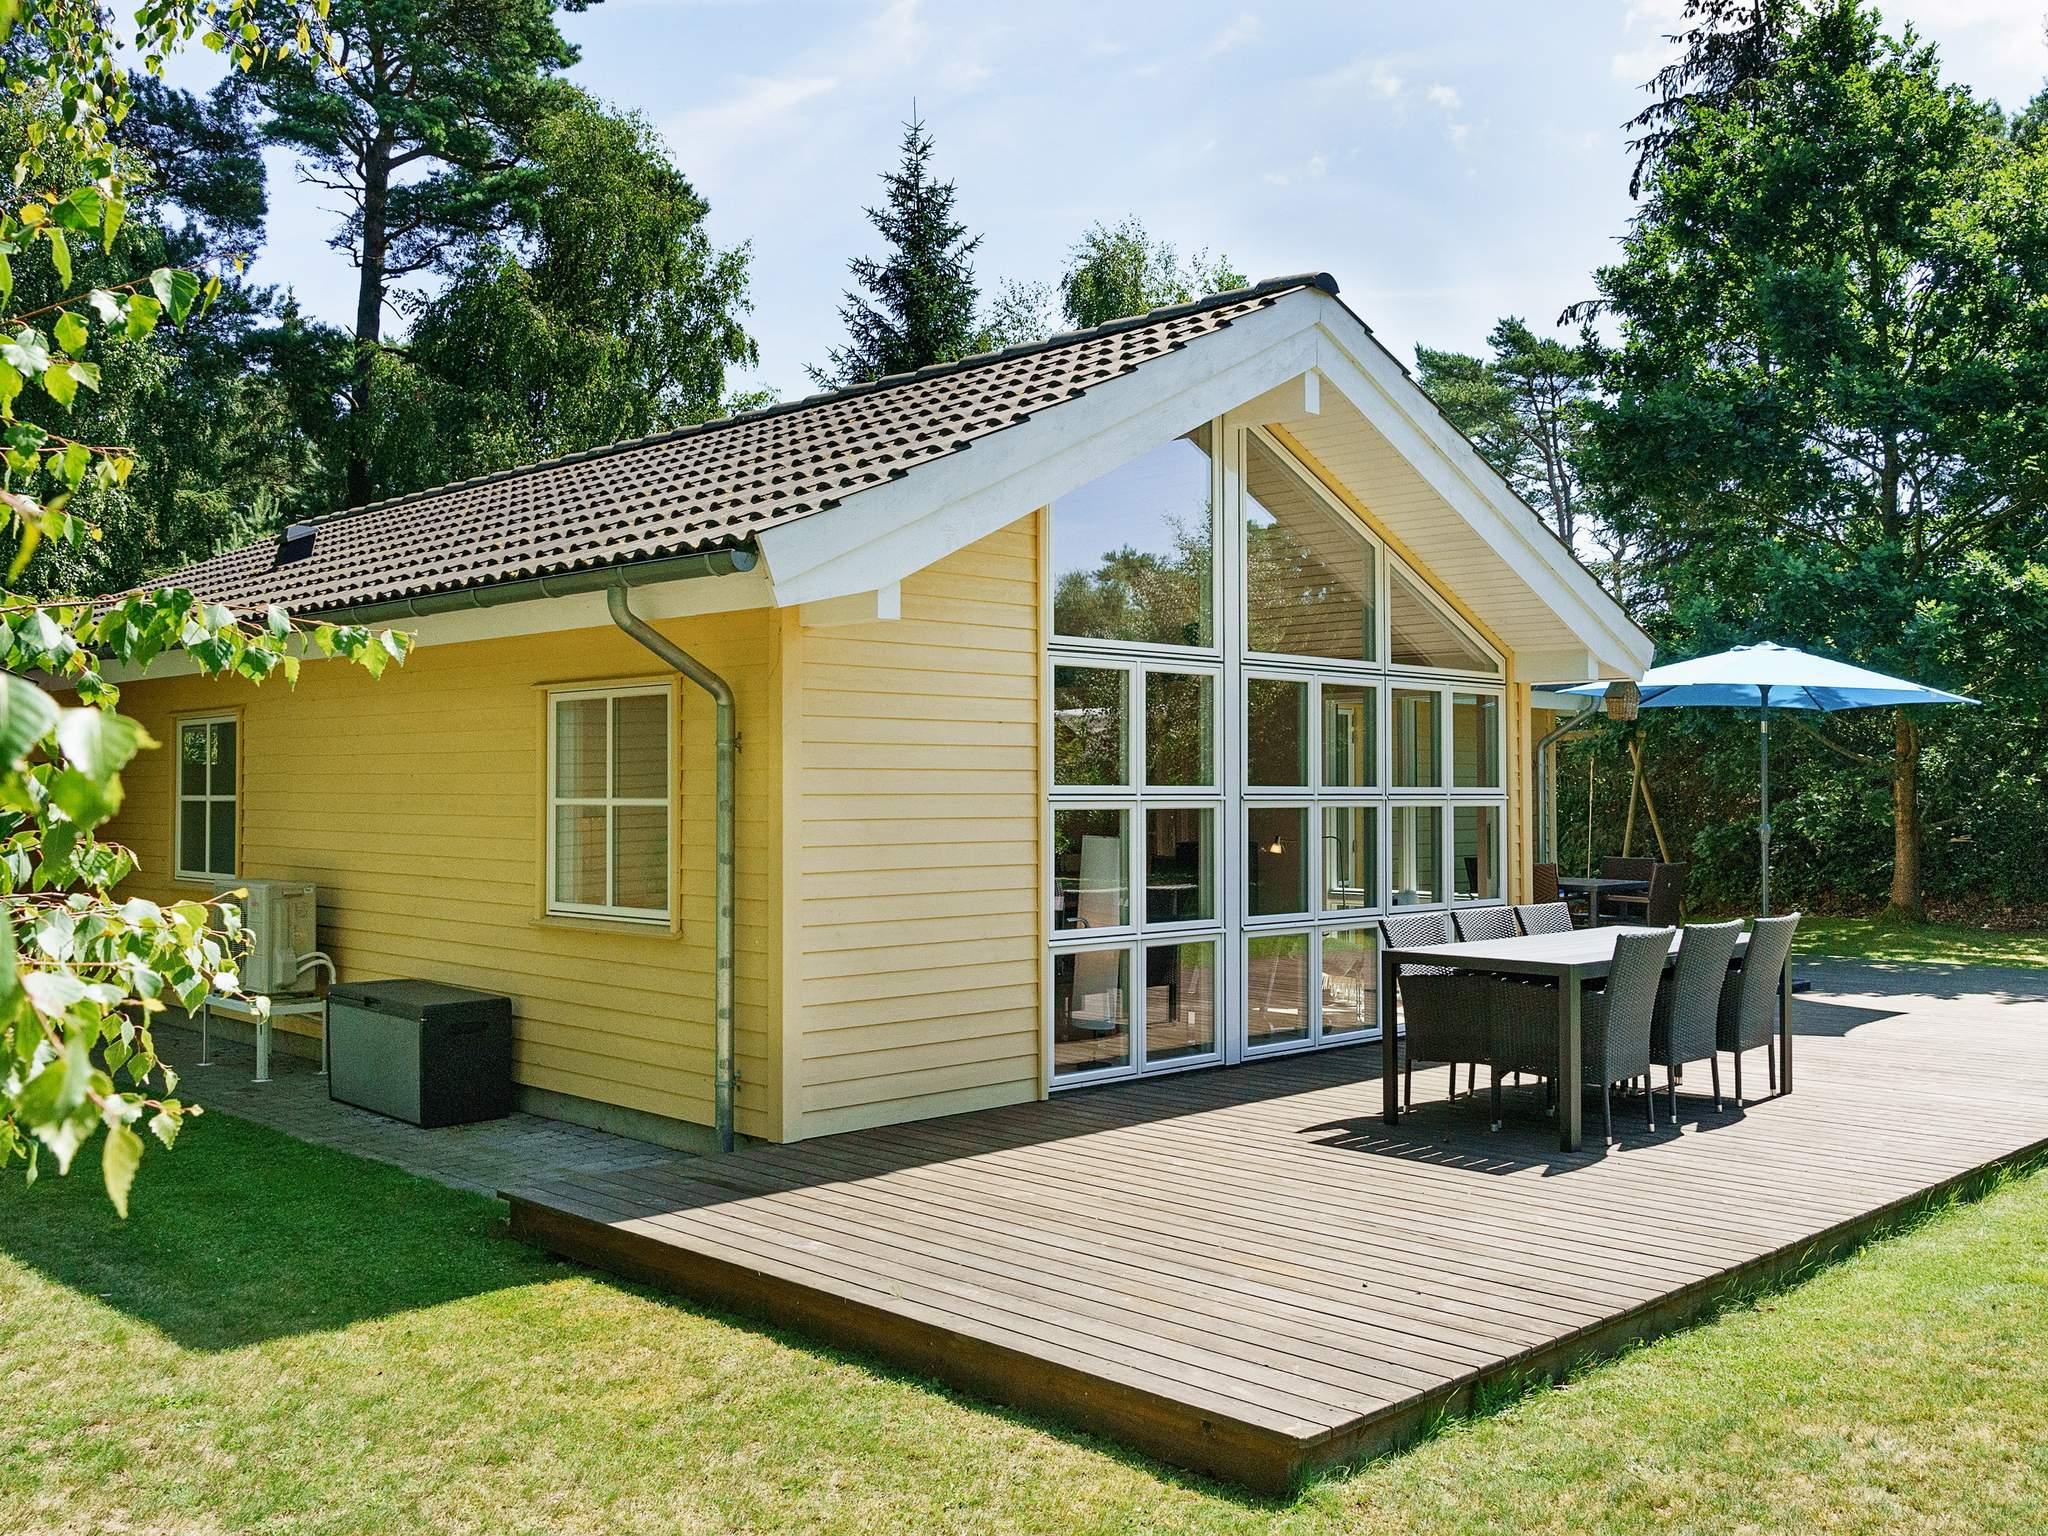 Ferienhaus Balka Strand (312137), Balke, , Bornholm, Dänemark, Bild 11